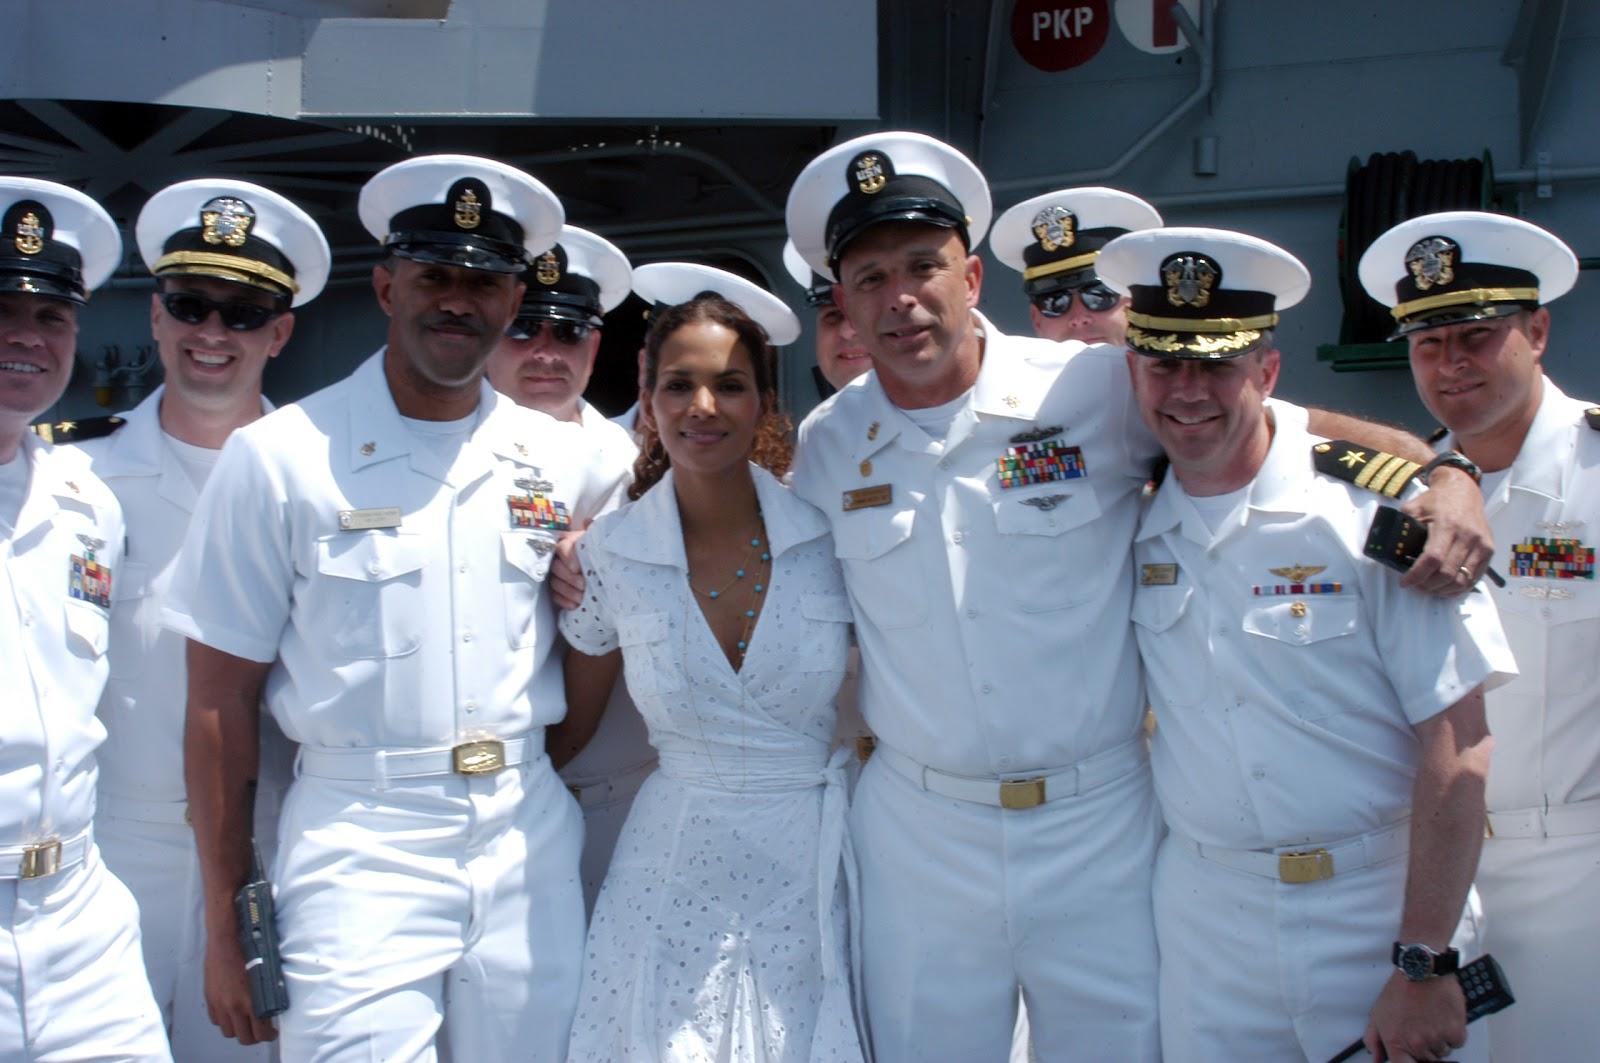 http://3.bp.blogspot.com/-IPLeMqW0qXU/T71_nIPyGOI/AAAAAAAACqw/epvonaBq4xM/s1600/US_Navy_060.jpg